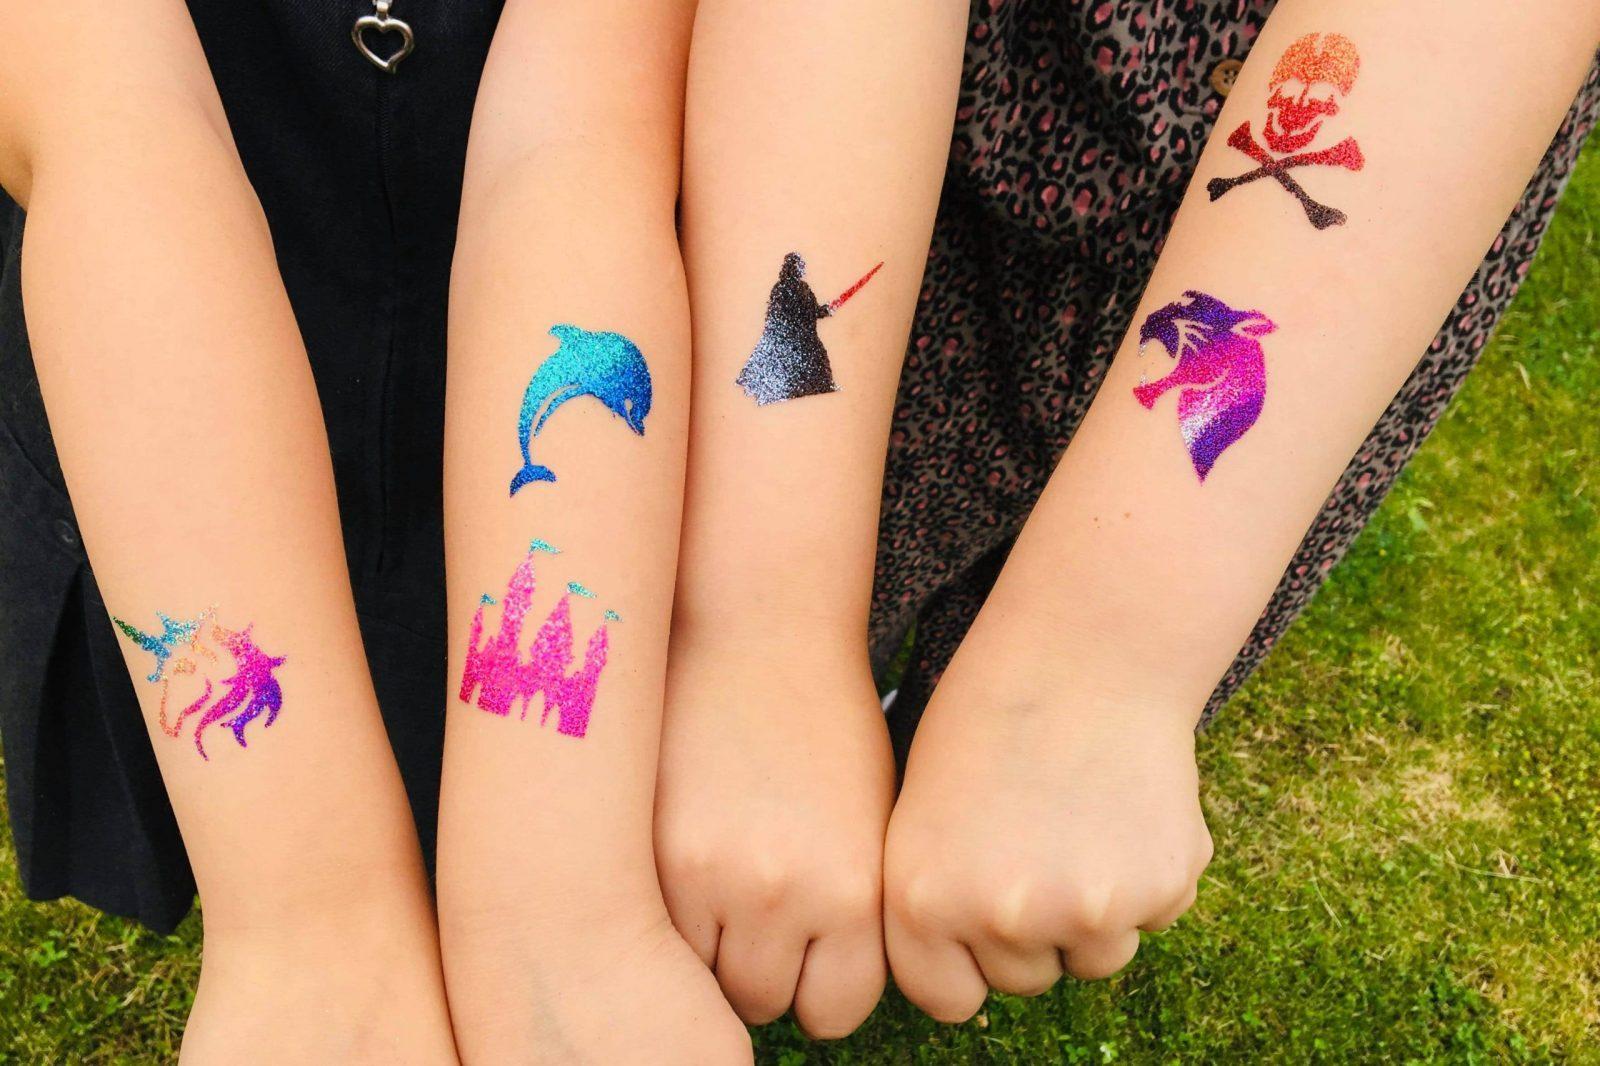 Temporary Tattoo Store - kids temporary tattoos, childrens tattoos, glitter tattoos for kids, kids tattoos uk